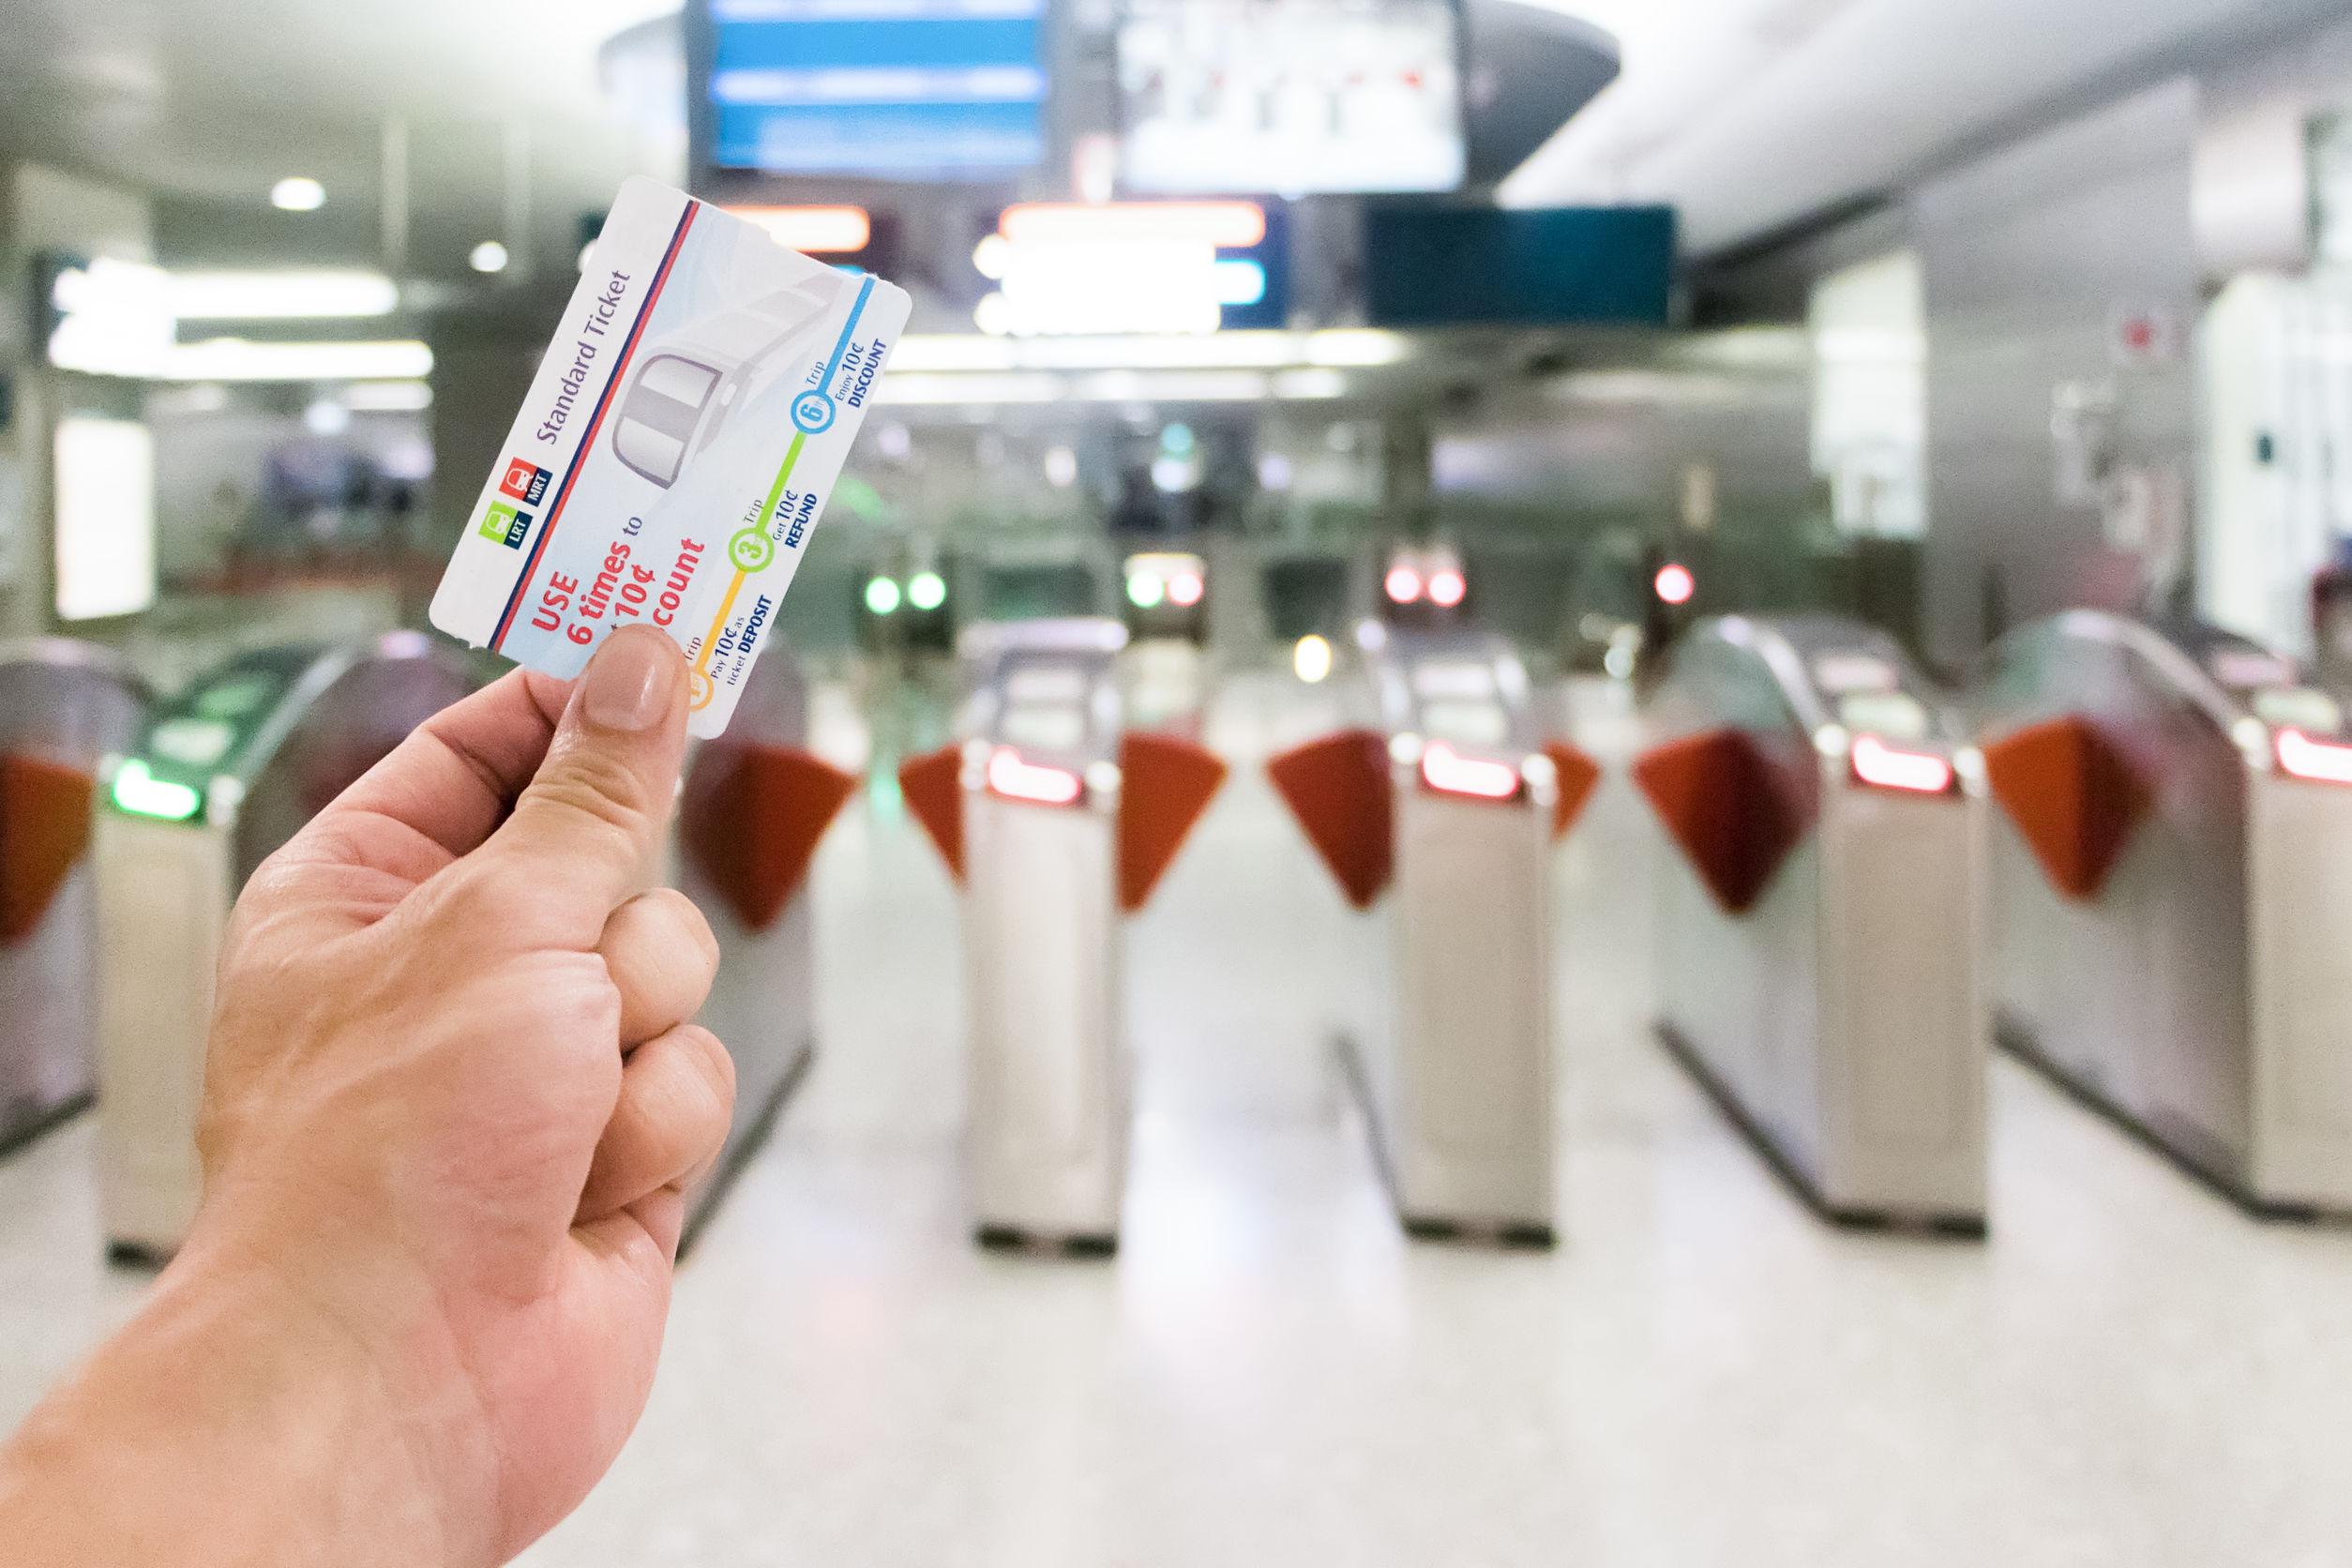 Stock Photo - 25-February 2018 Passenger holding ticket at the entrance at Singapore MRT station